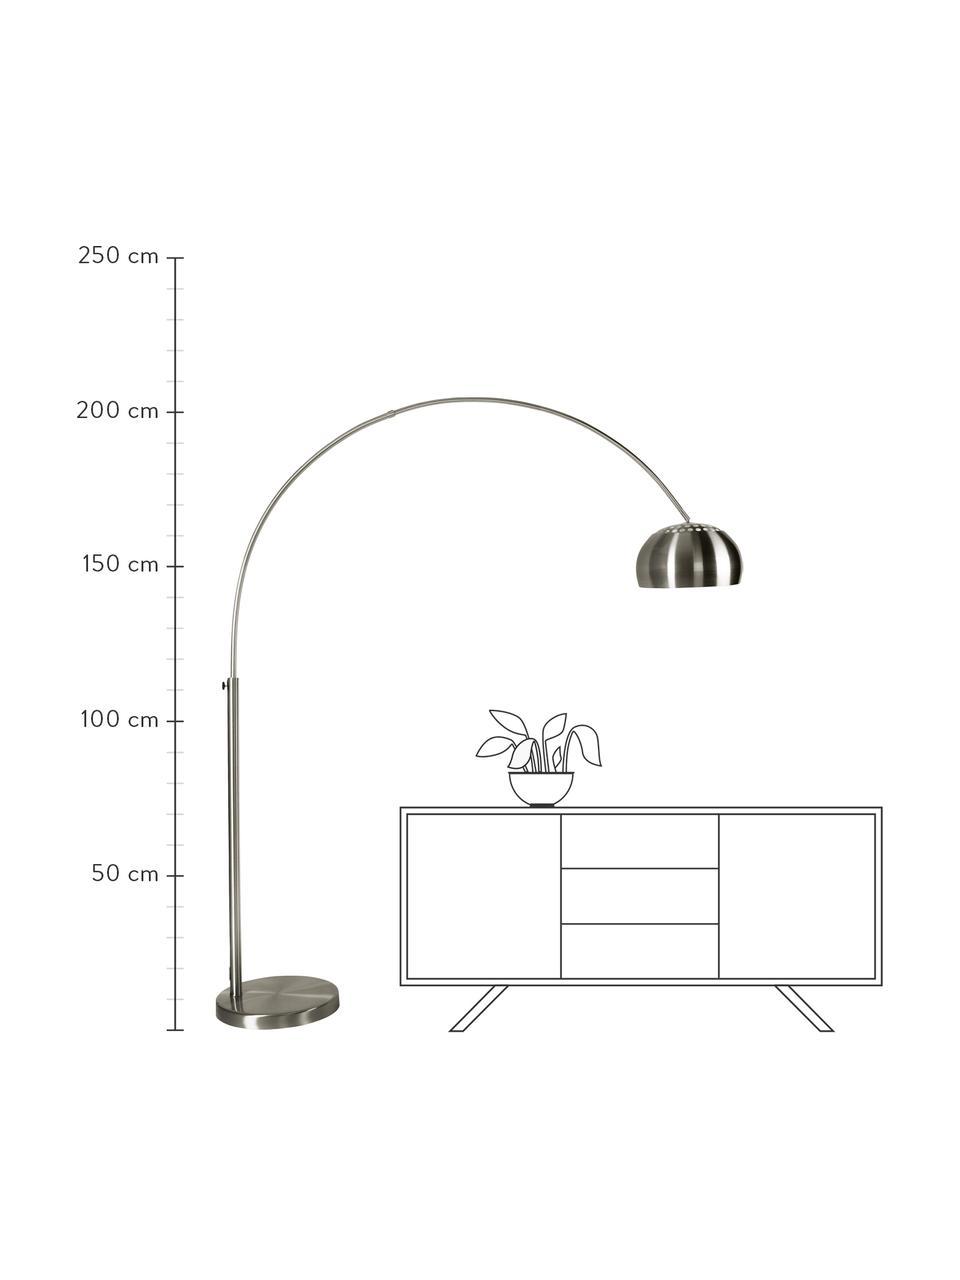 Große Bogenlampe Metal Bow in Silber, Lampenschirm: Metall, gebürstet, Gestell: Metall, gebürstet, Lampenfuß: Stein mit versilberter Me, Metall, 170 x 205 cm